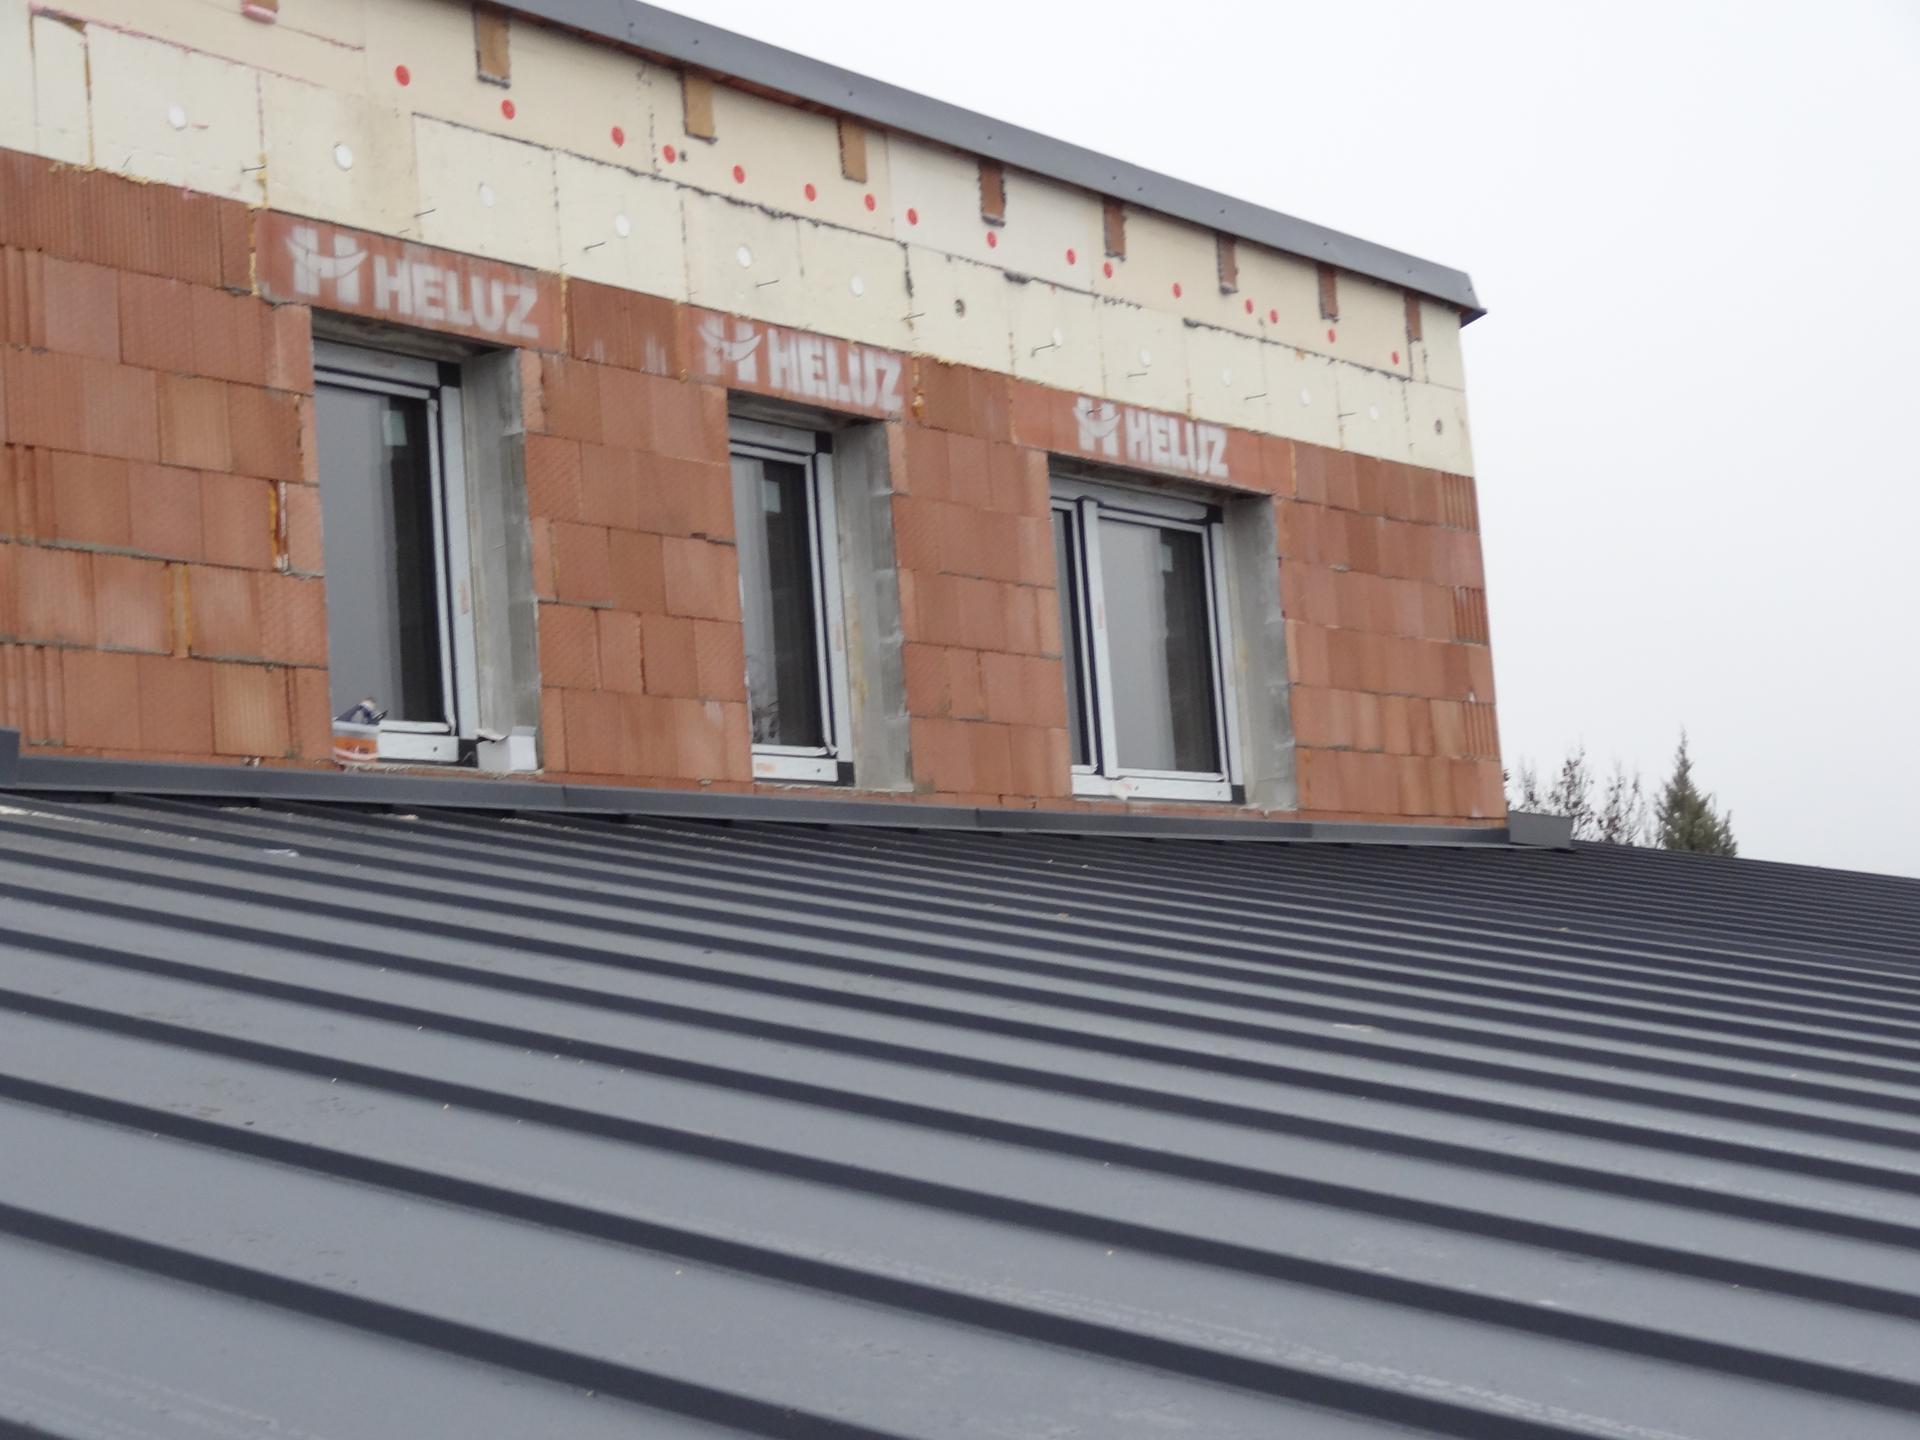 Stavba domečku pokračuje - Střecha okolo patra